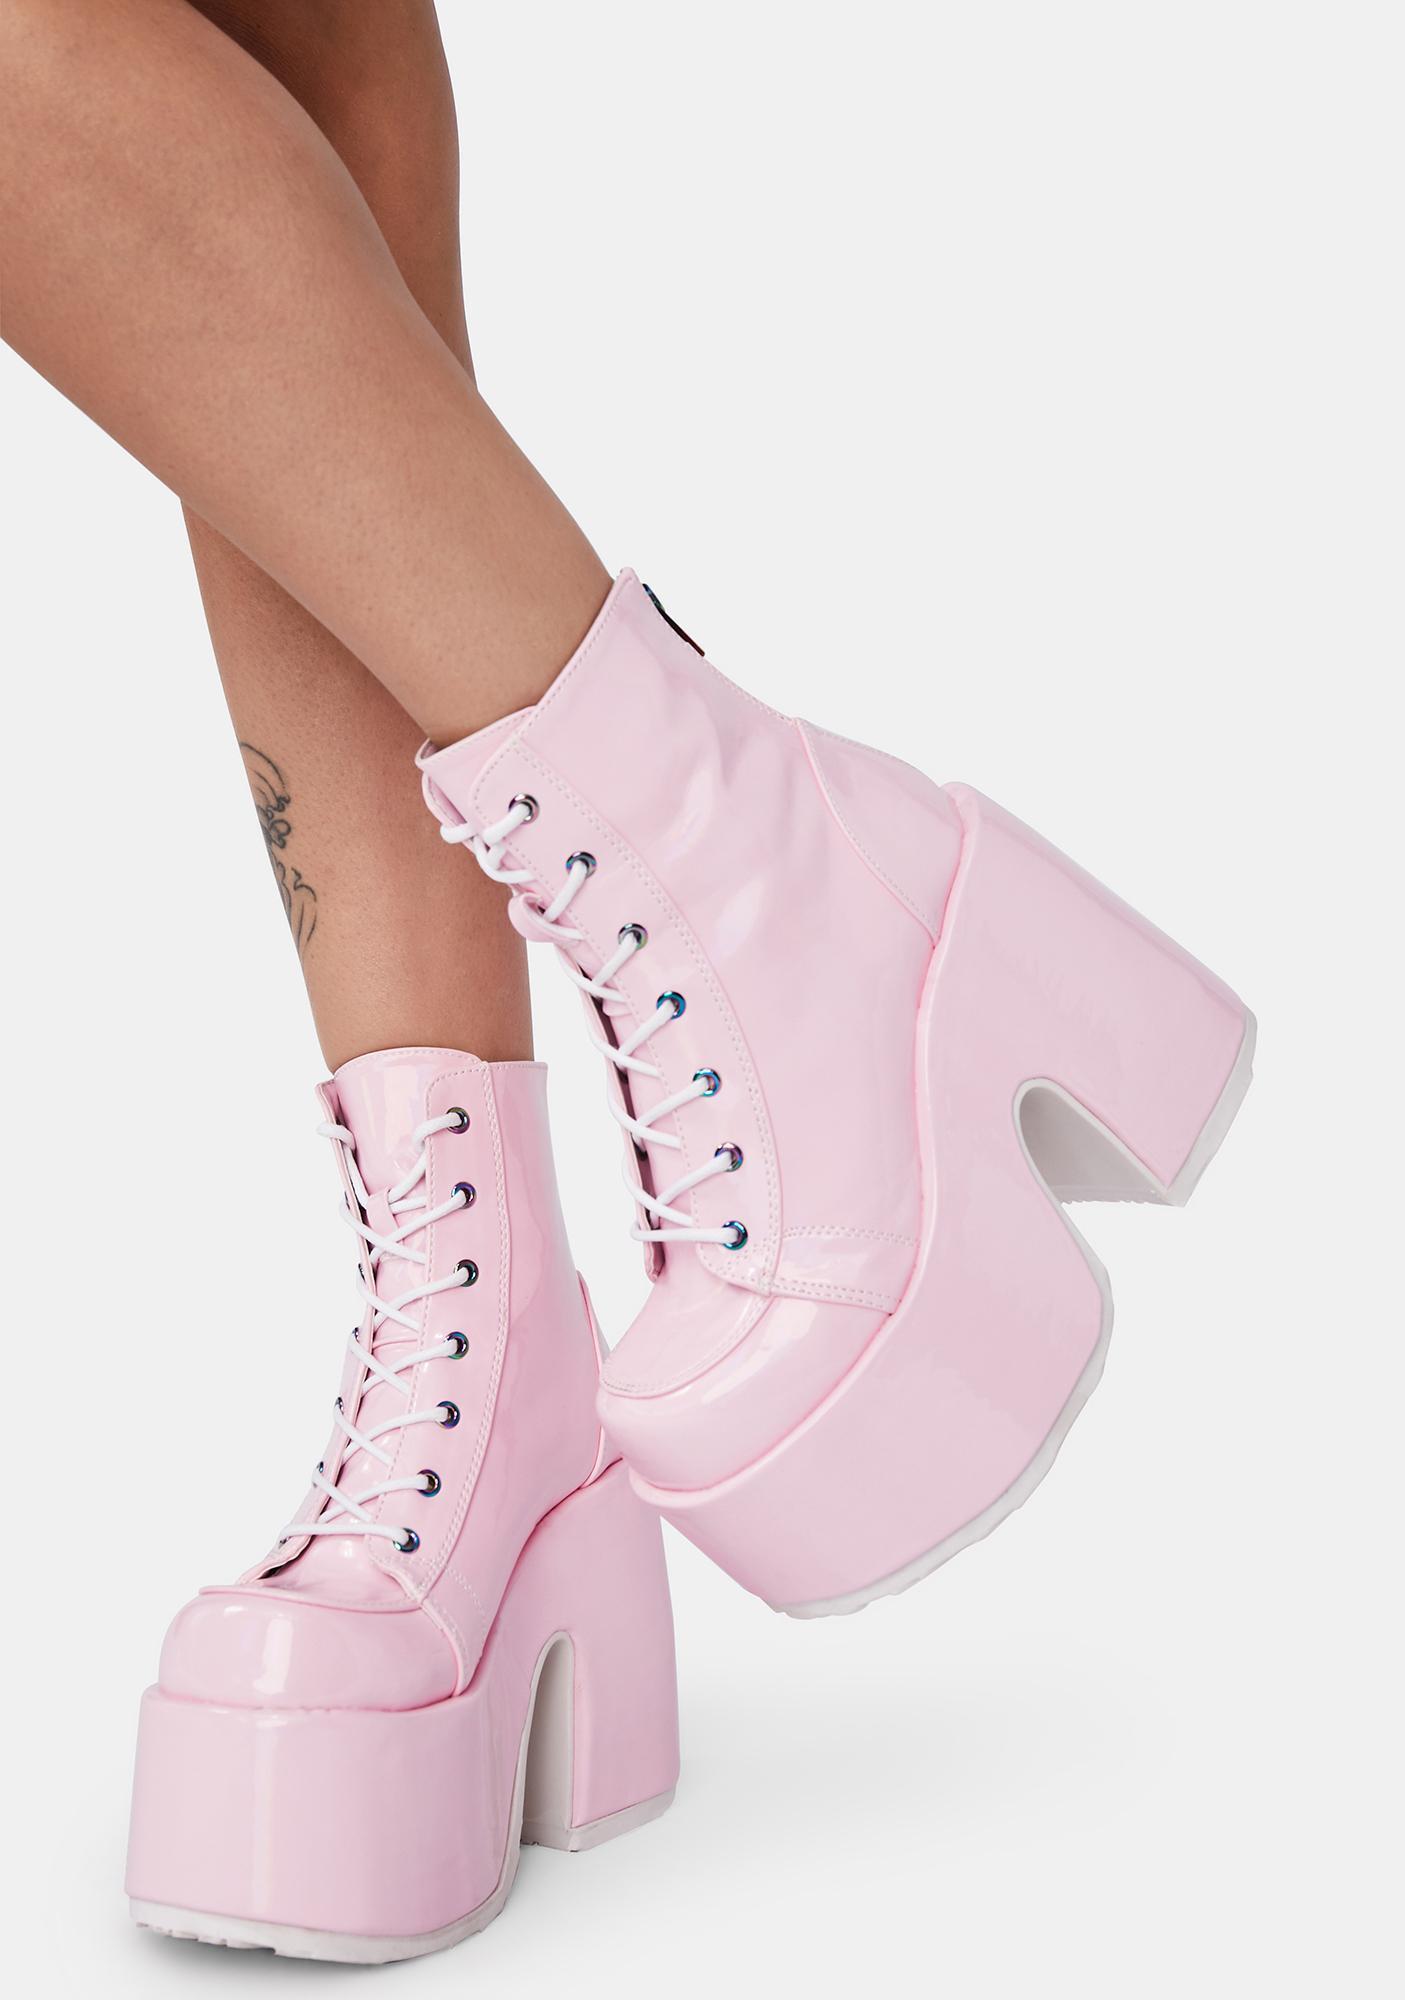 Demonia Bubblegum Rave Royalty Platform Boots